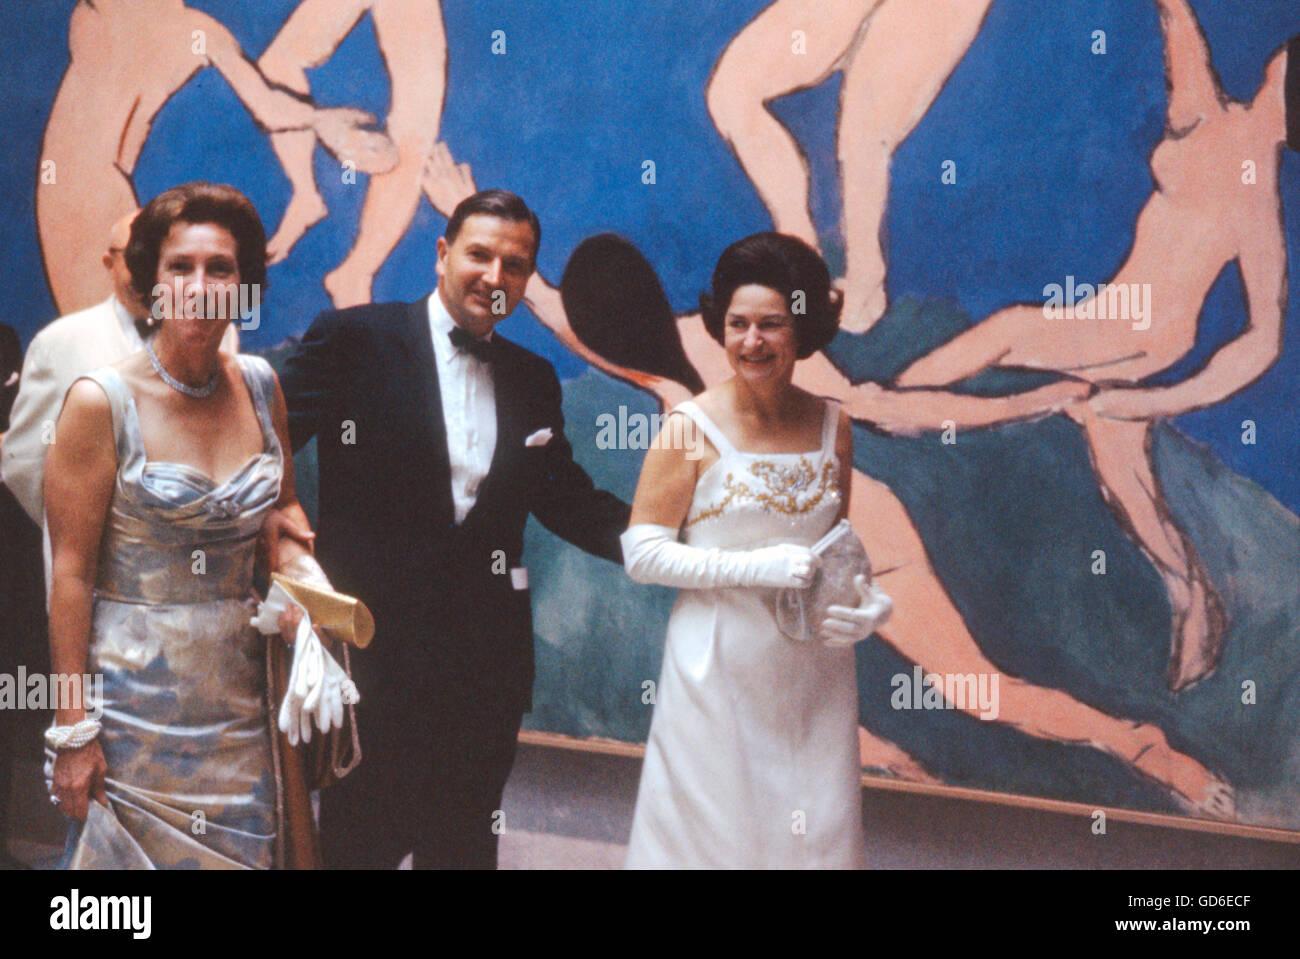 Lady Bird Johnson, David Rockefeller, and Peggy Rockefeller, Stock Photo